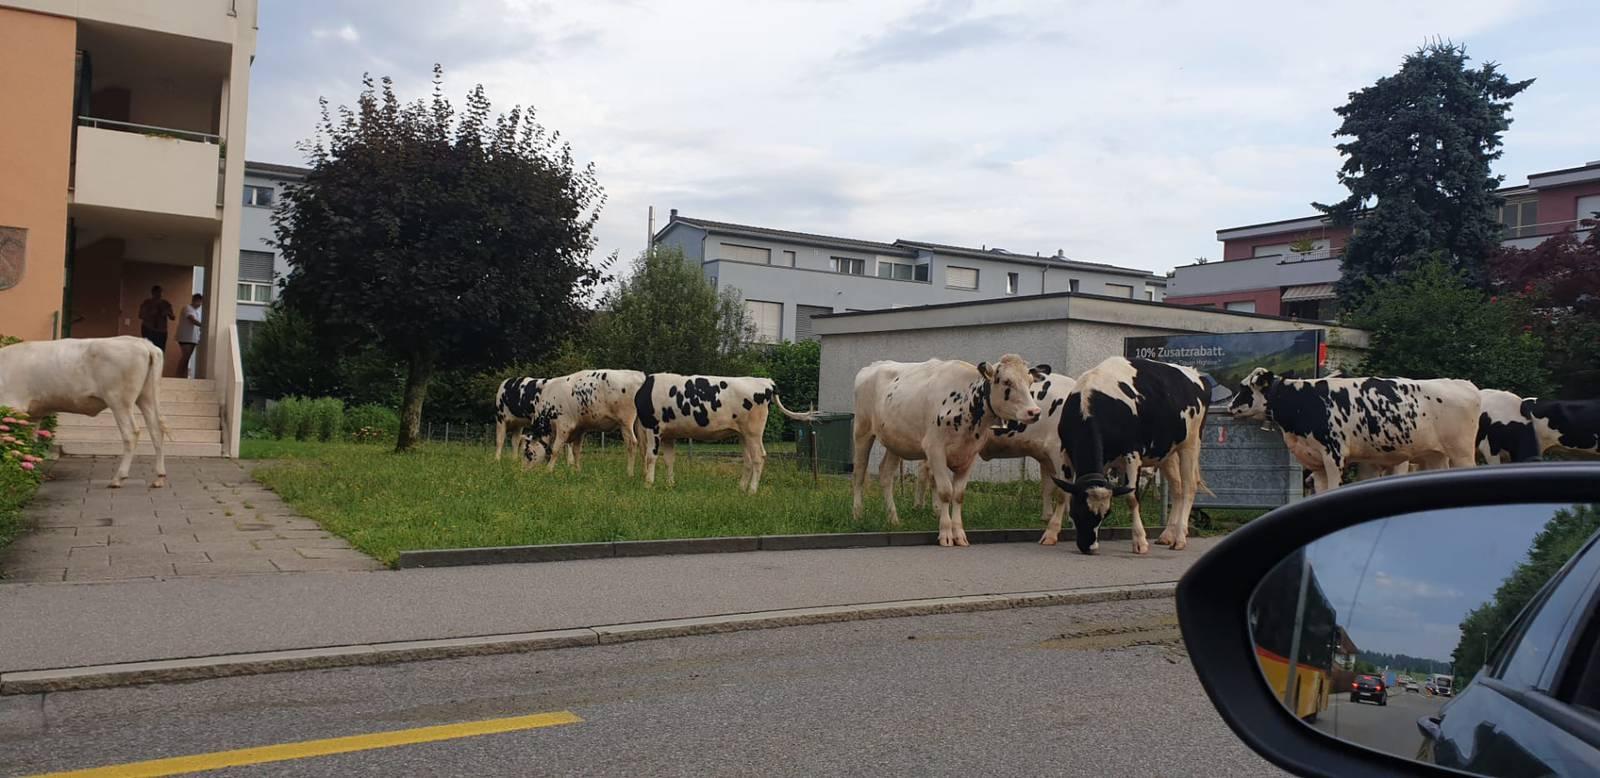 Kühe ausgebrochen (© AZ-Leserreporter)